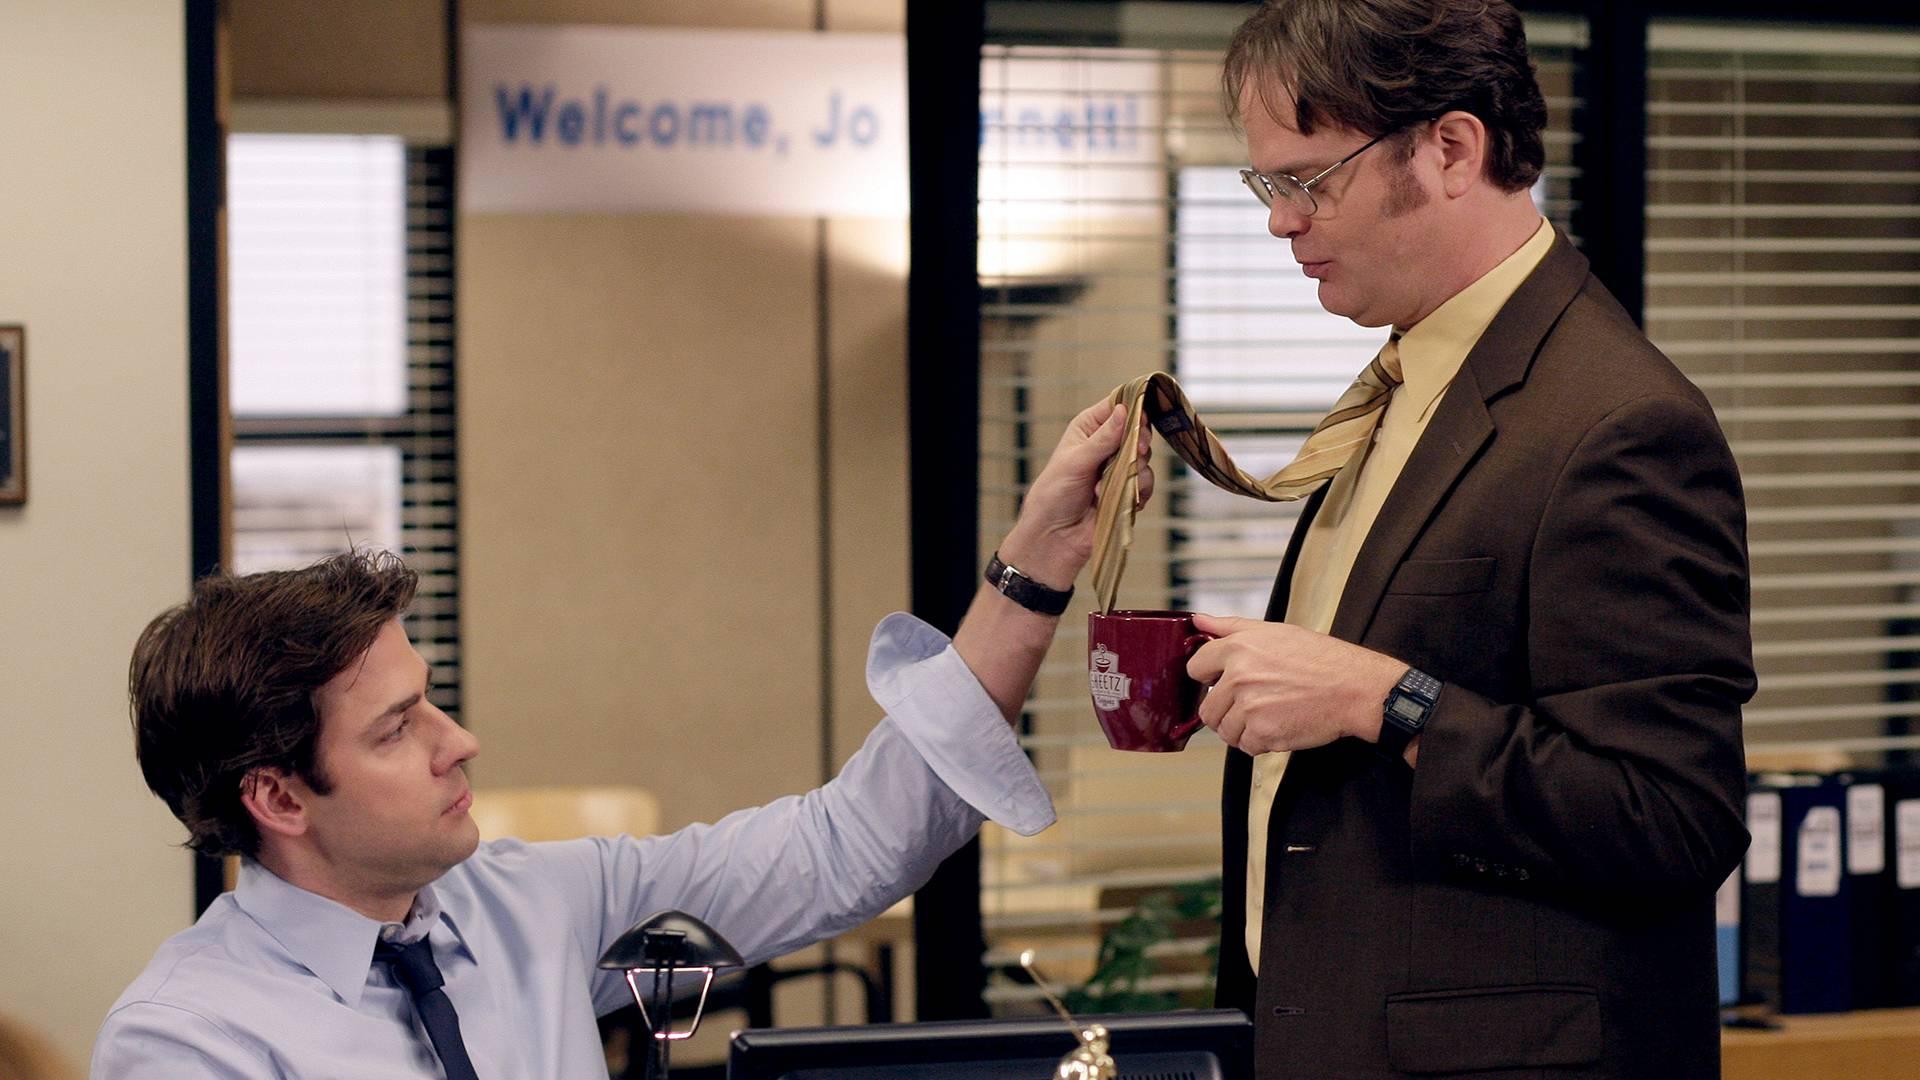 The Office Season 6 Episode 16